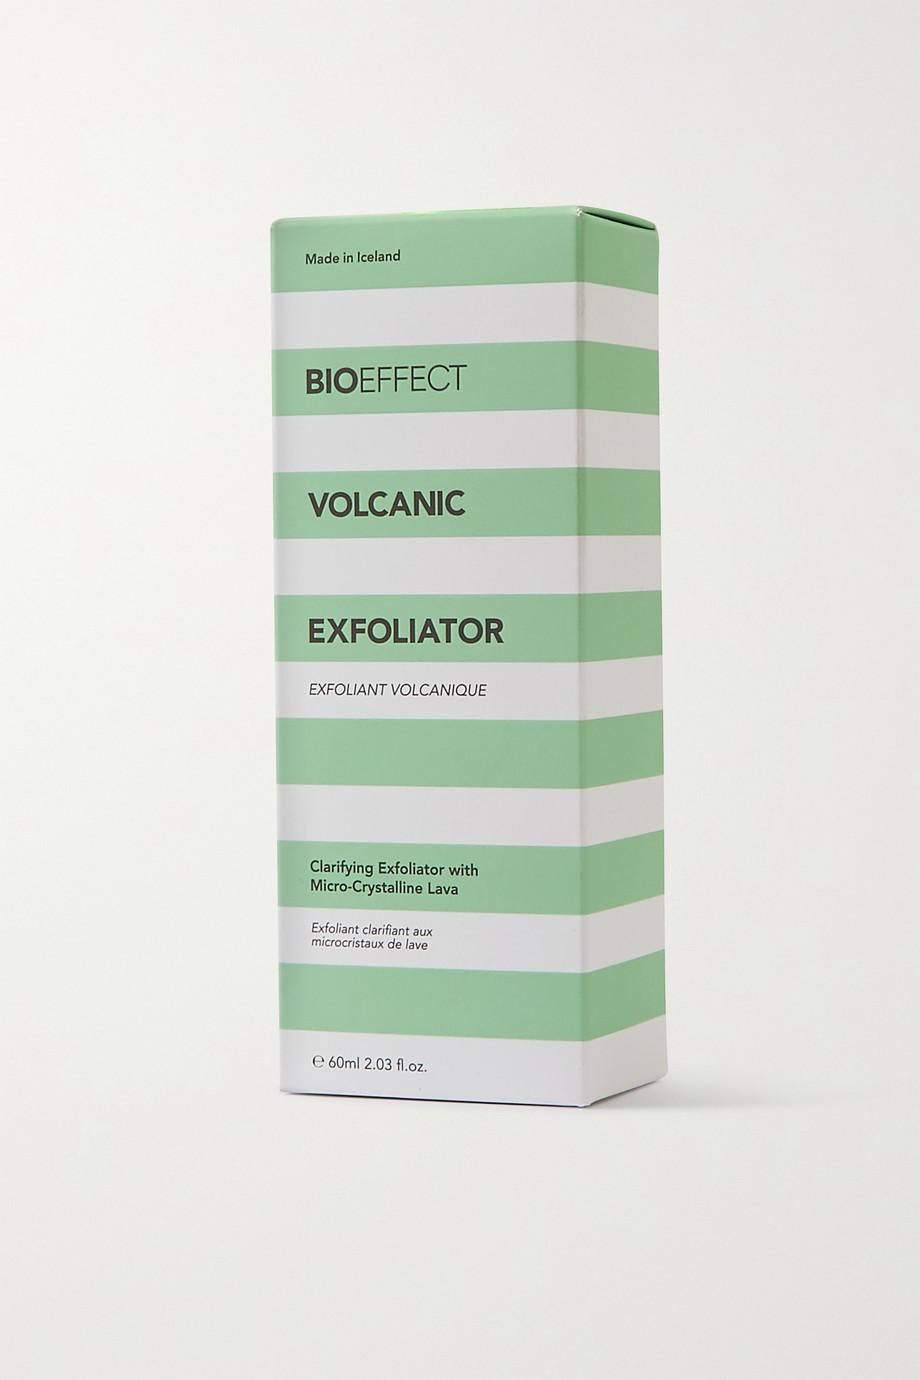 BIOEFFECT Volcanic Exfoliator, 60ml